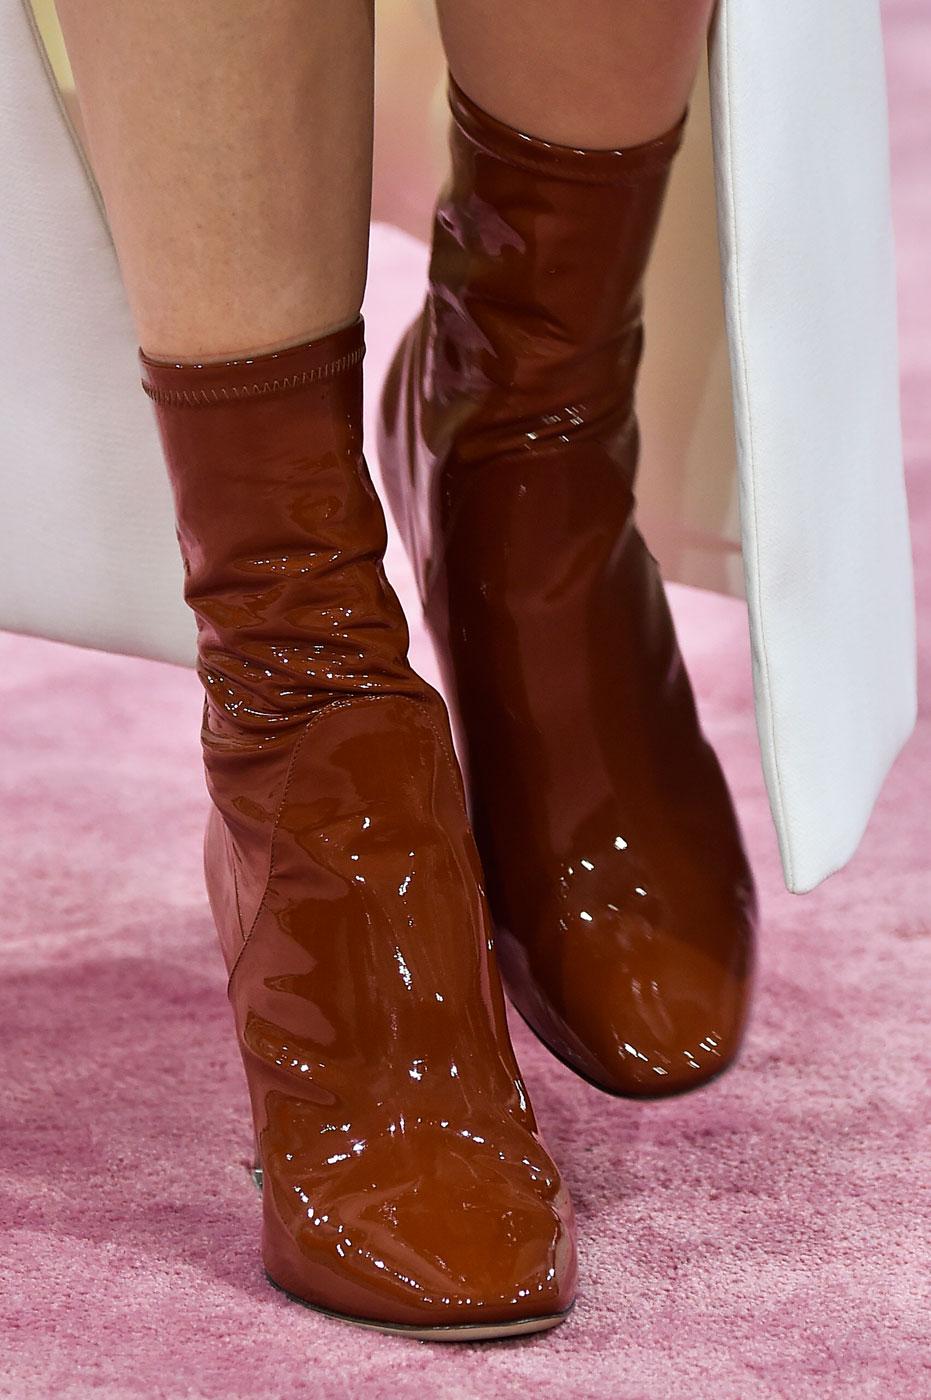 Christian-Dior-fashion-runway-show-close-ups-haute-couture-paris-spring-summer-2015-the-impression-122